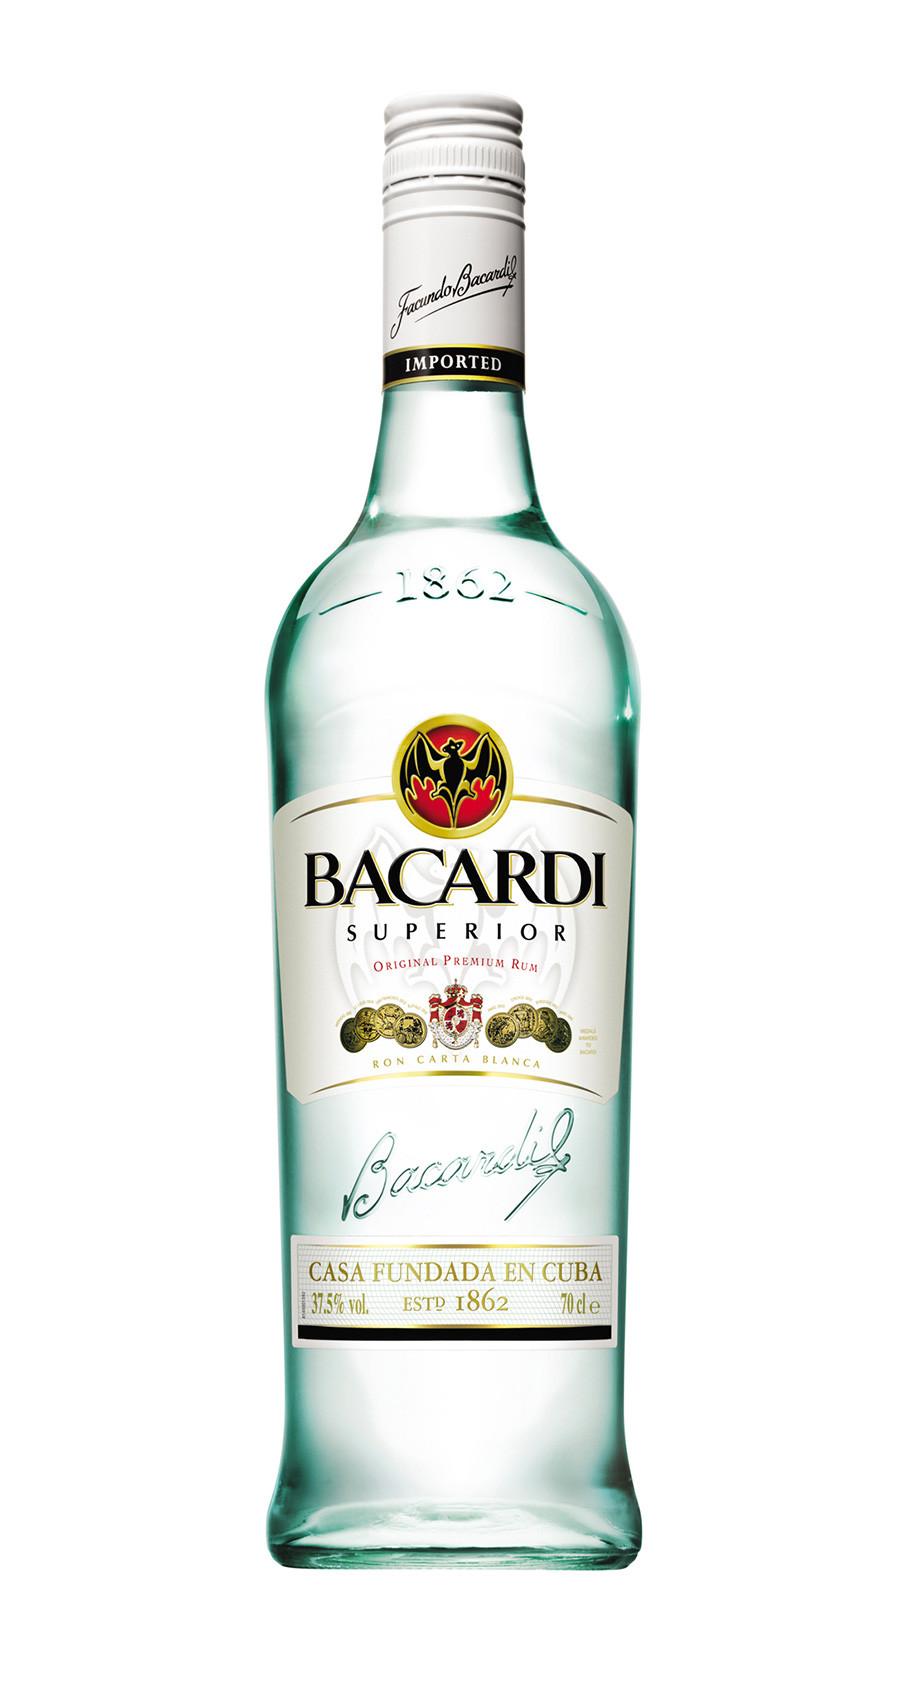 Bacardi_Superior.jpg